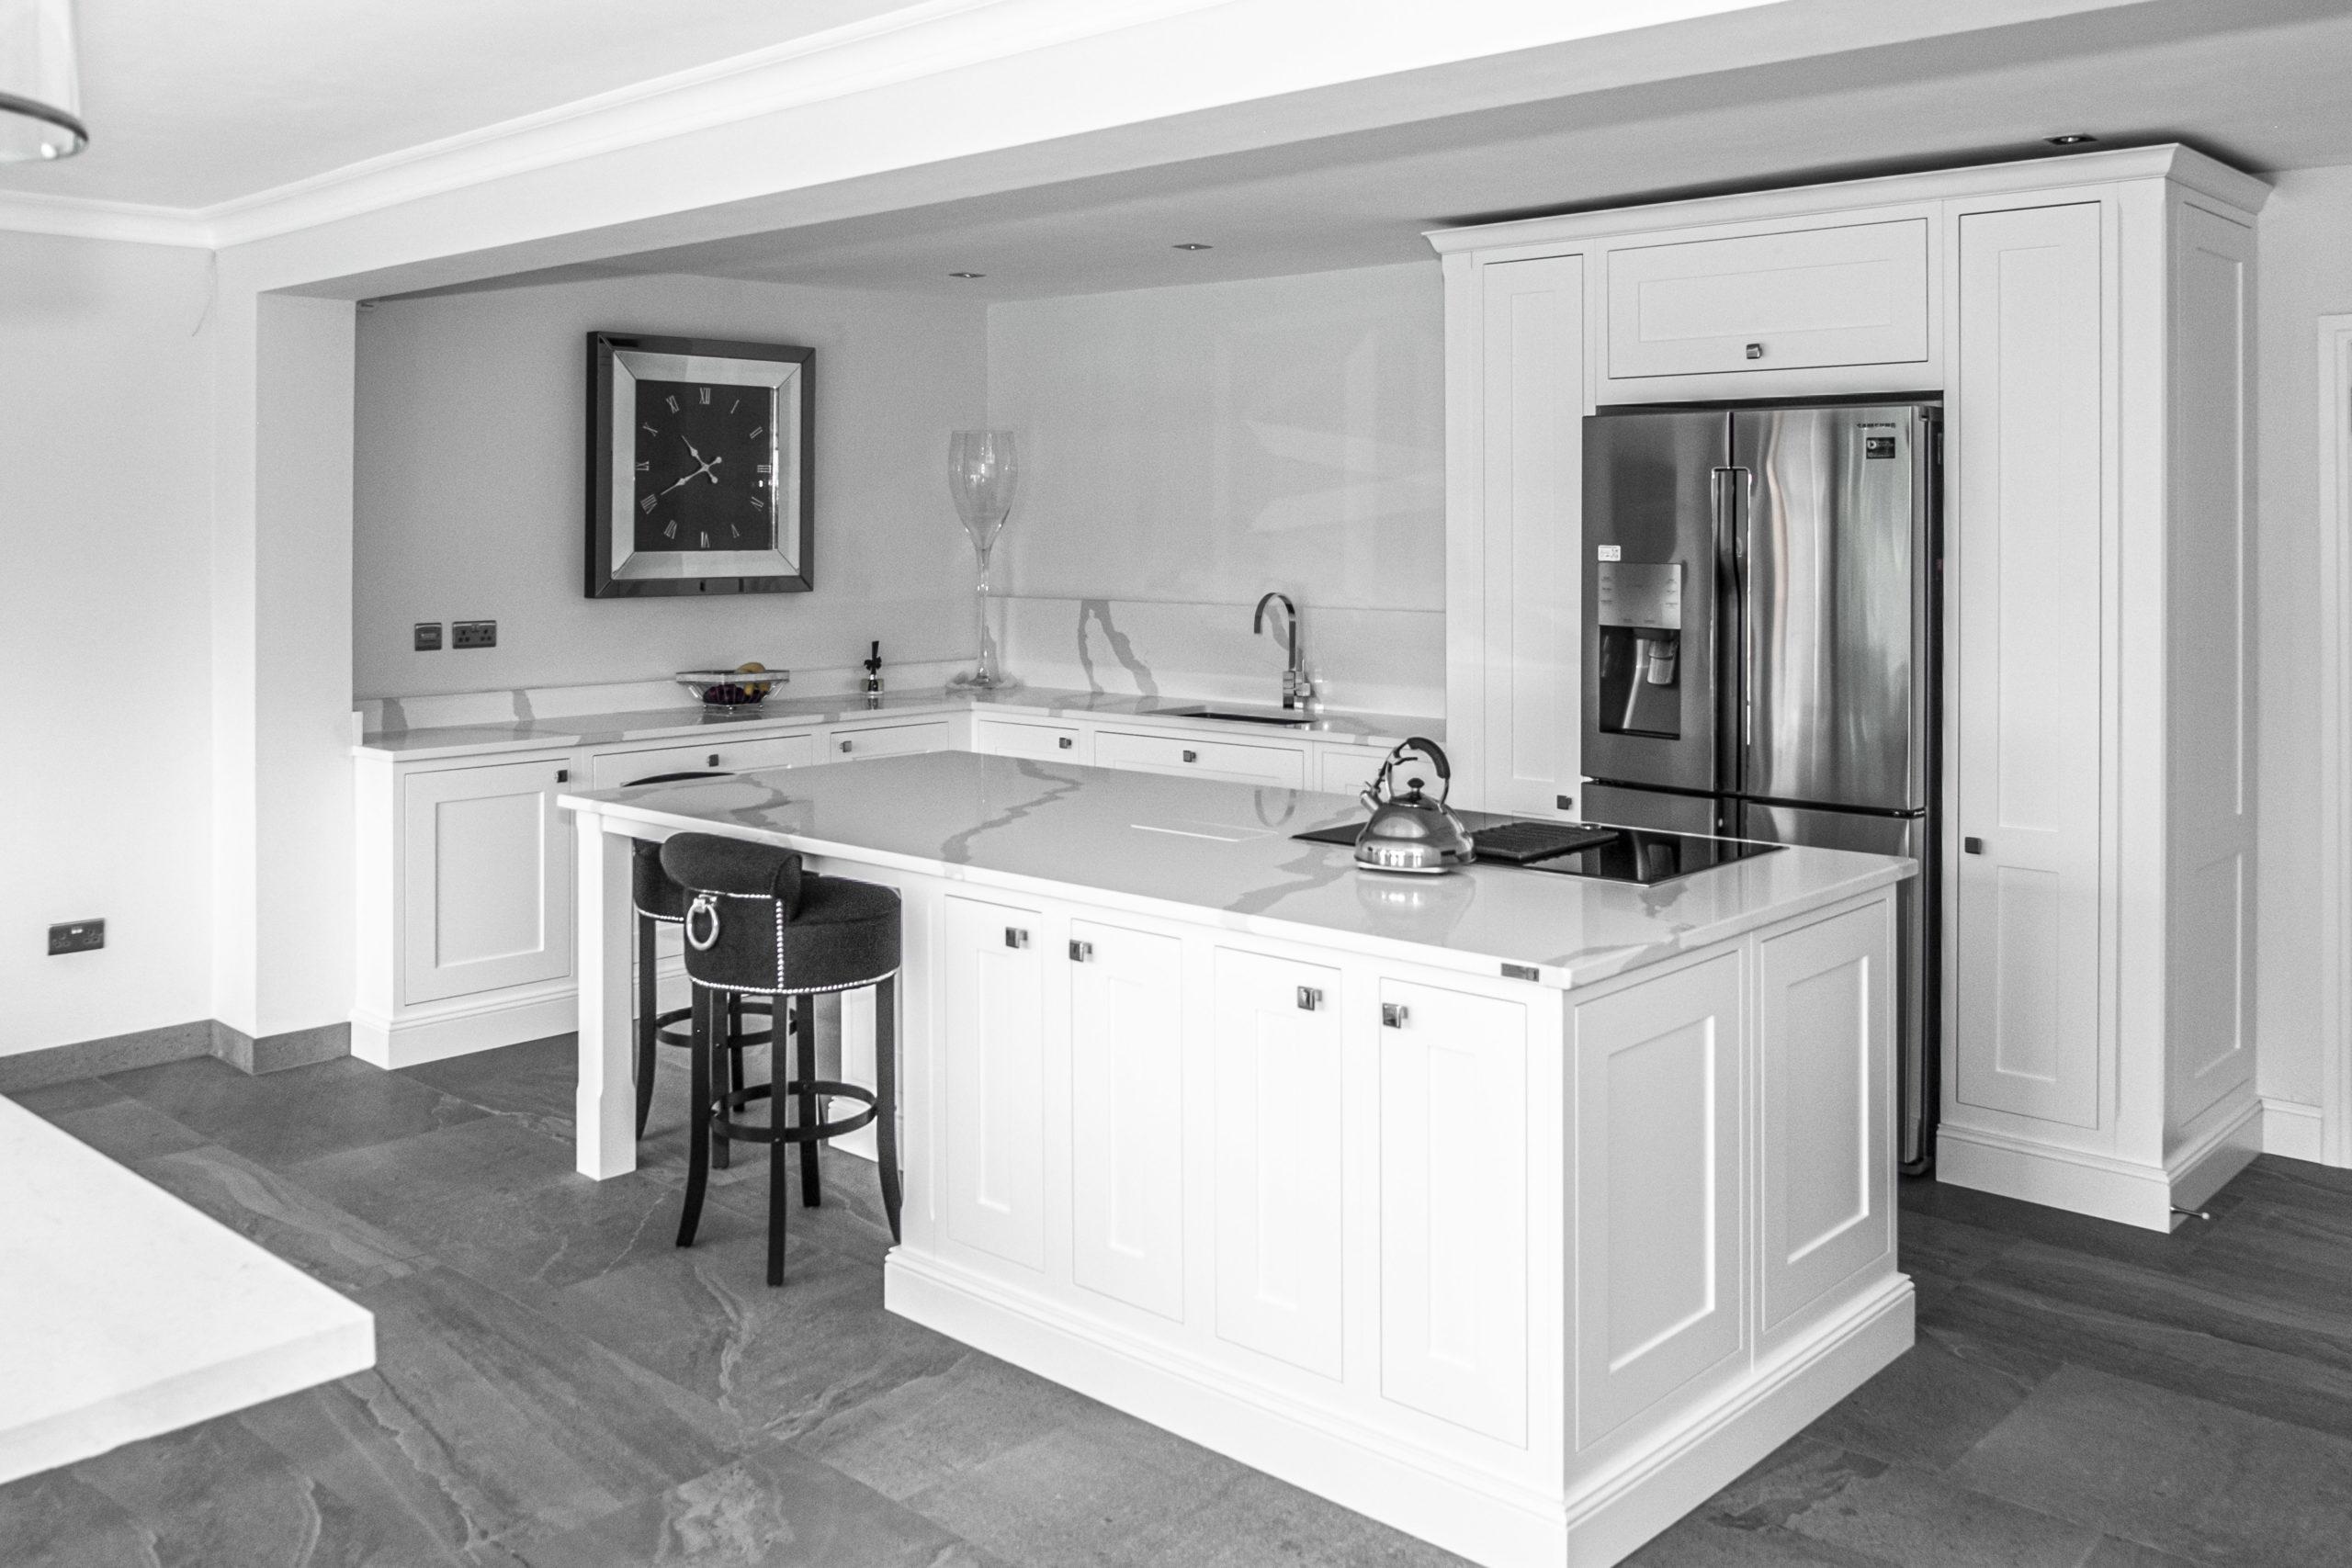 The KitchenLab ArtiVR image